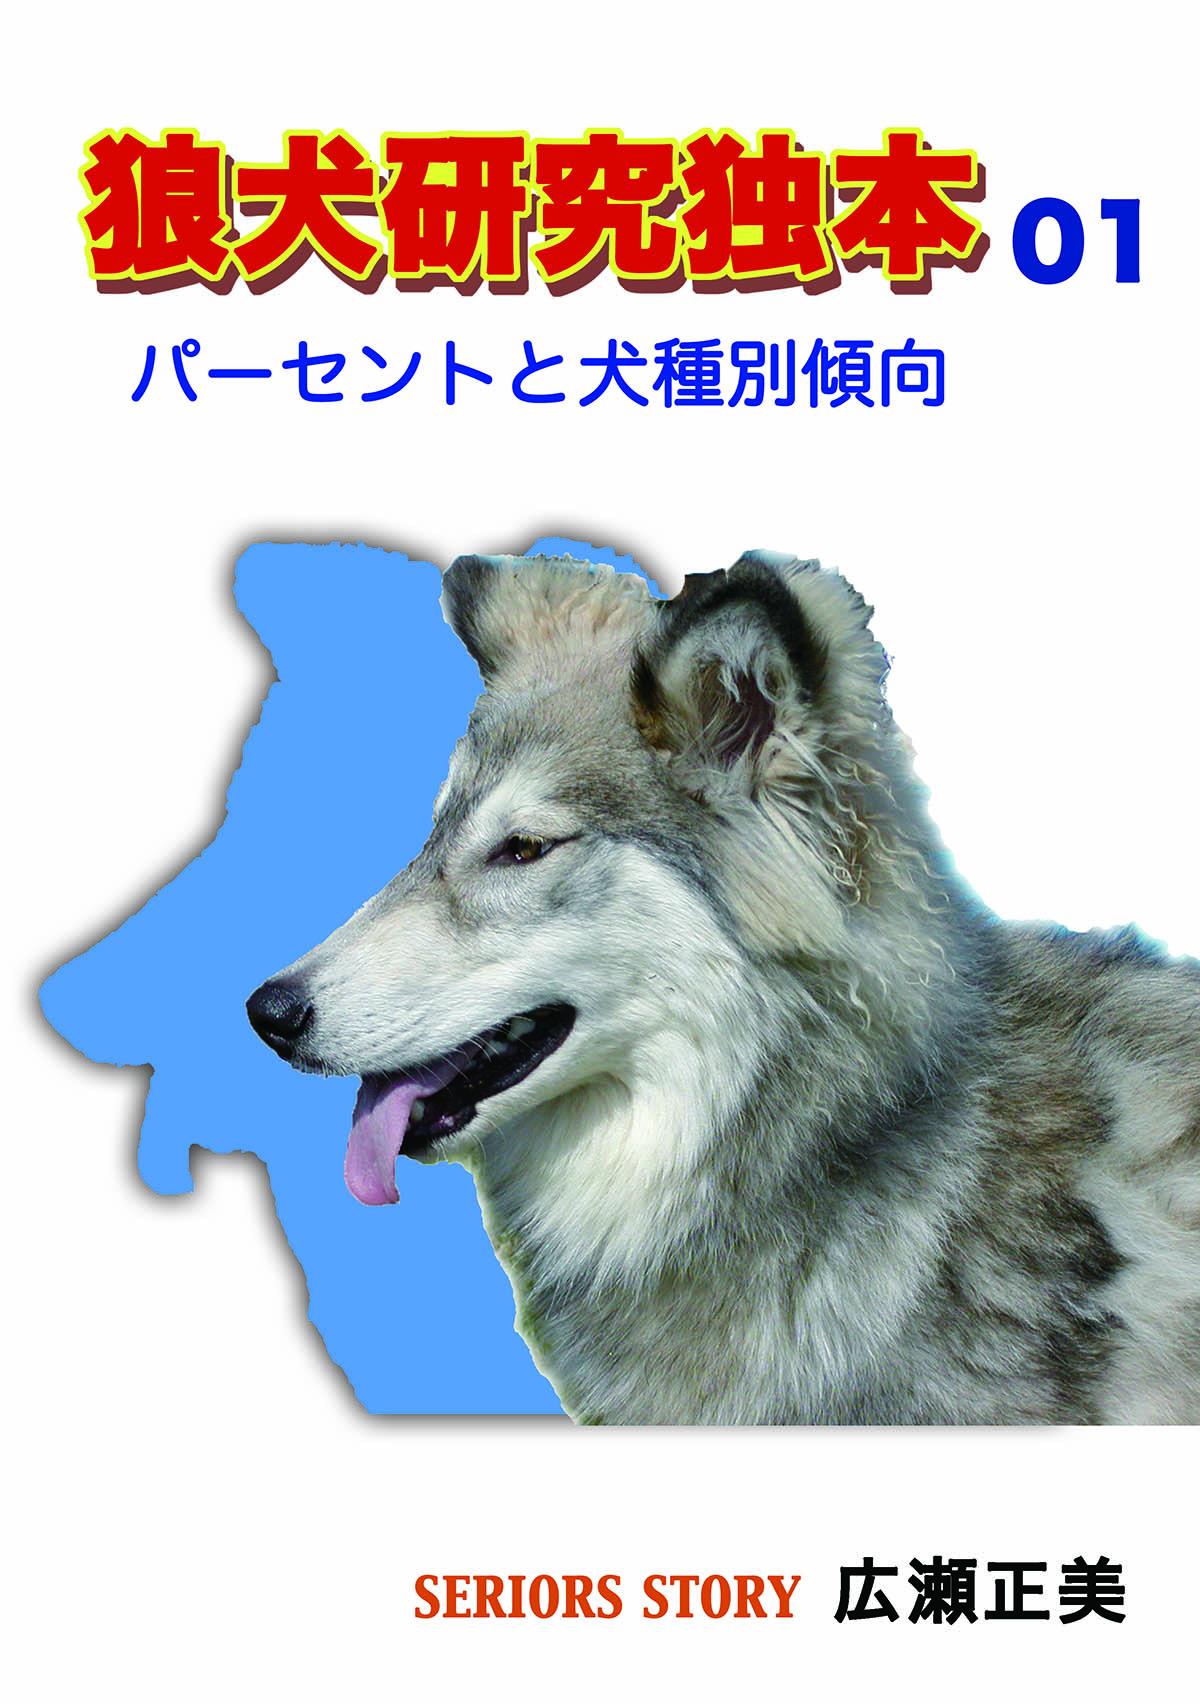 2016_SERIORS STORY 日本狼犬クラブ_03